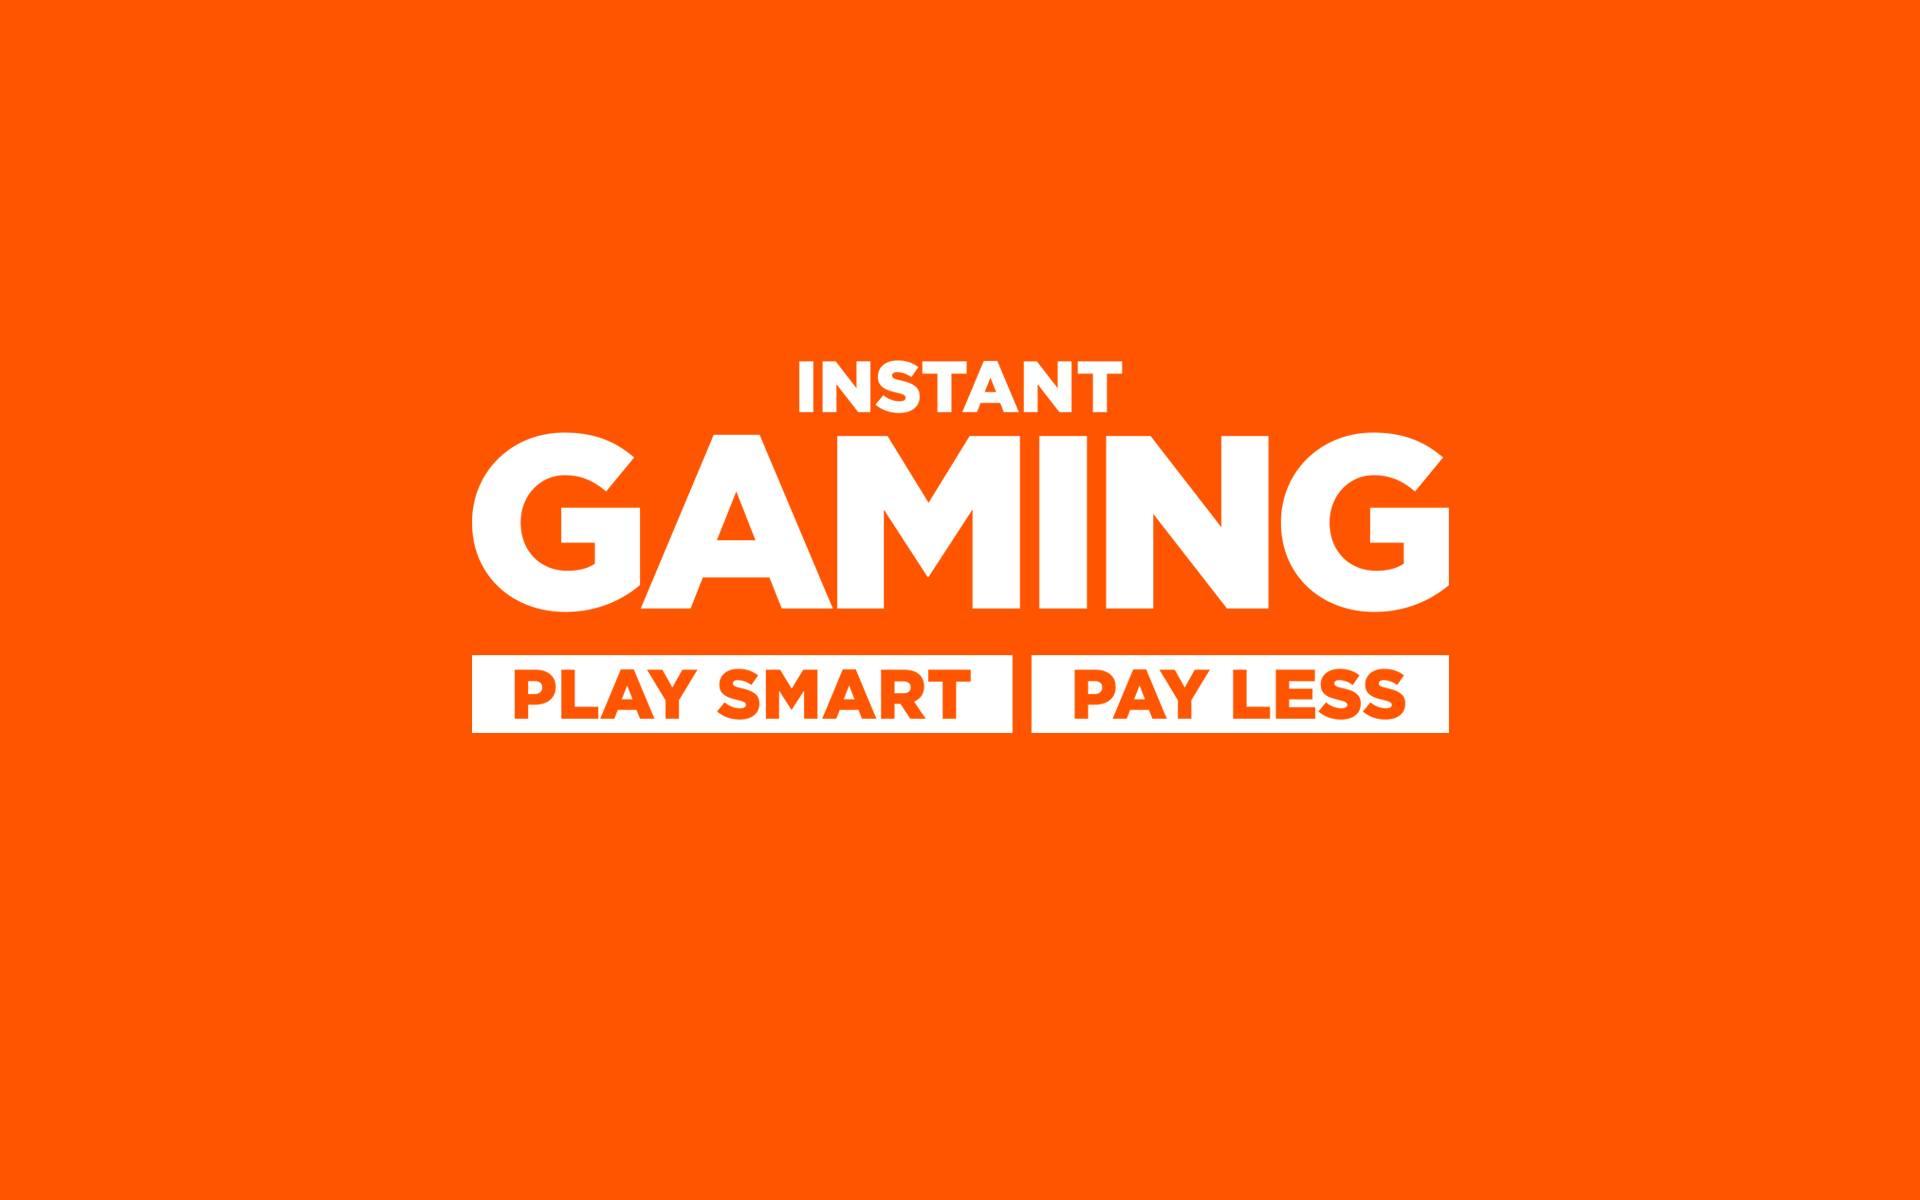 Instant Gaming logo 1920 x 1080